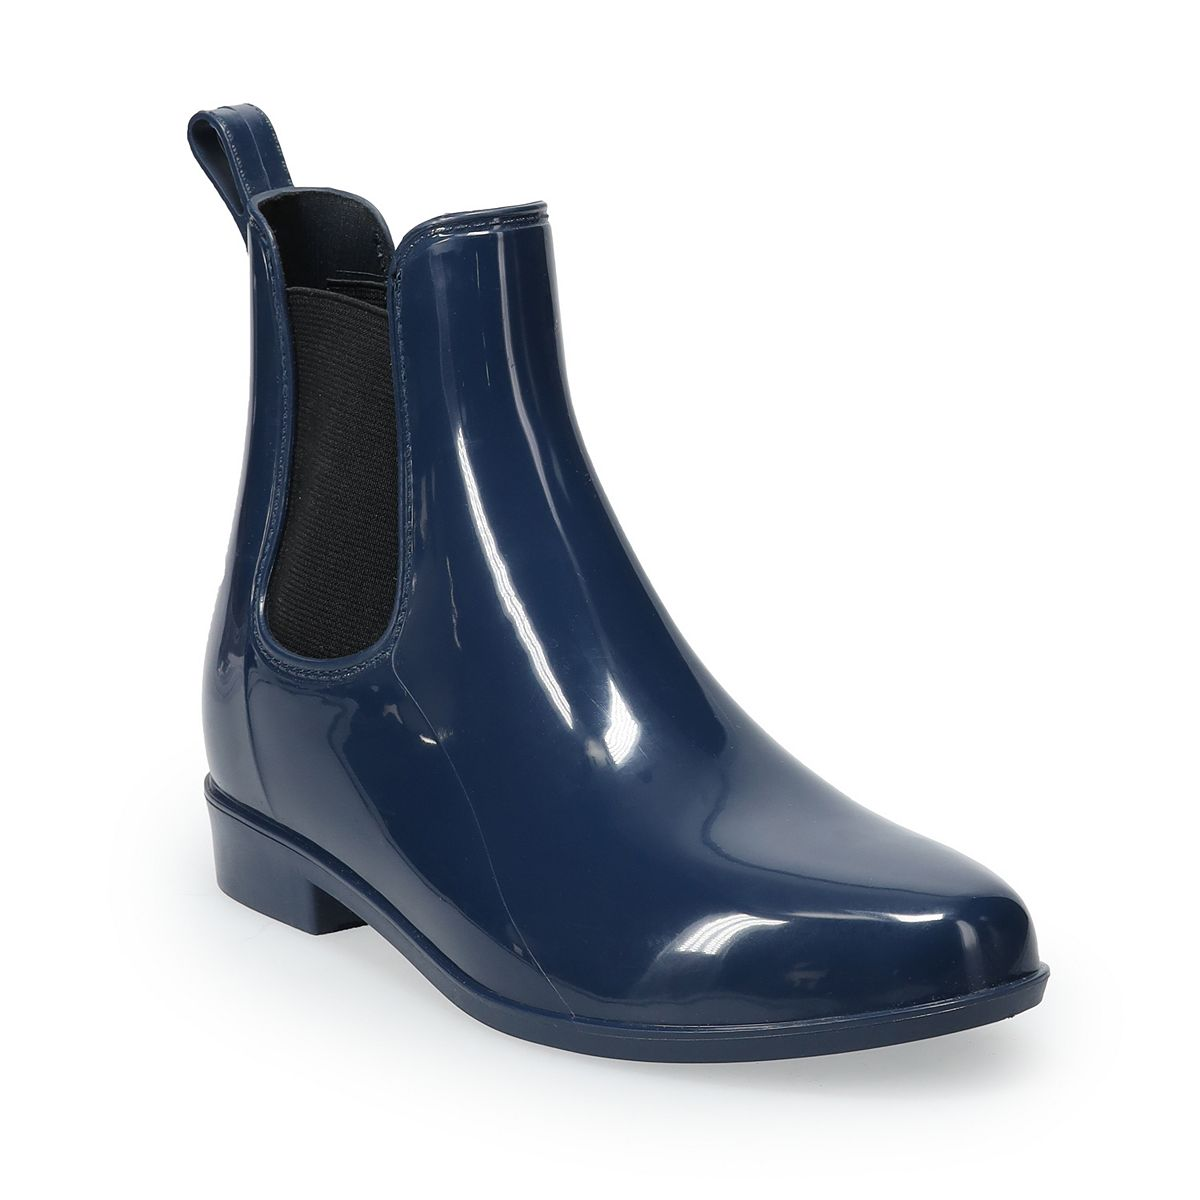 SO® Lizard Women's Rain Boots $9.59